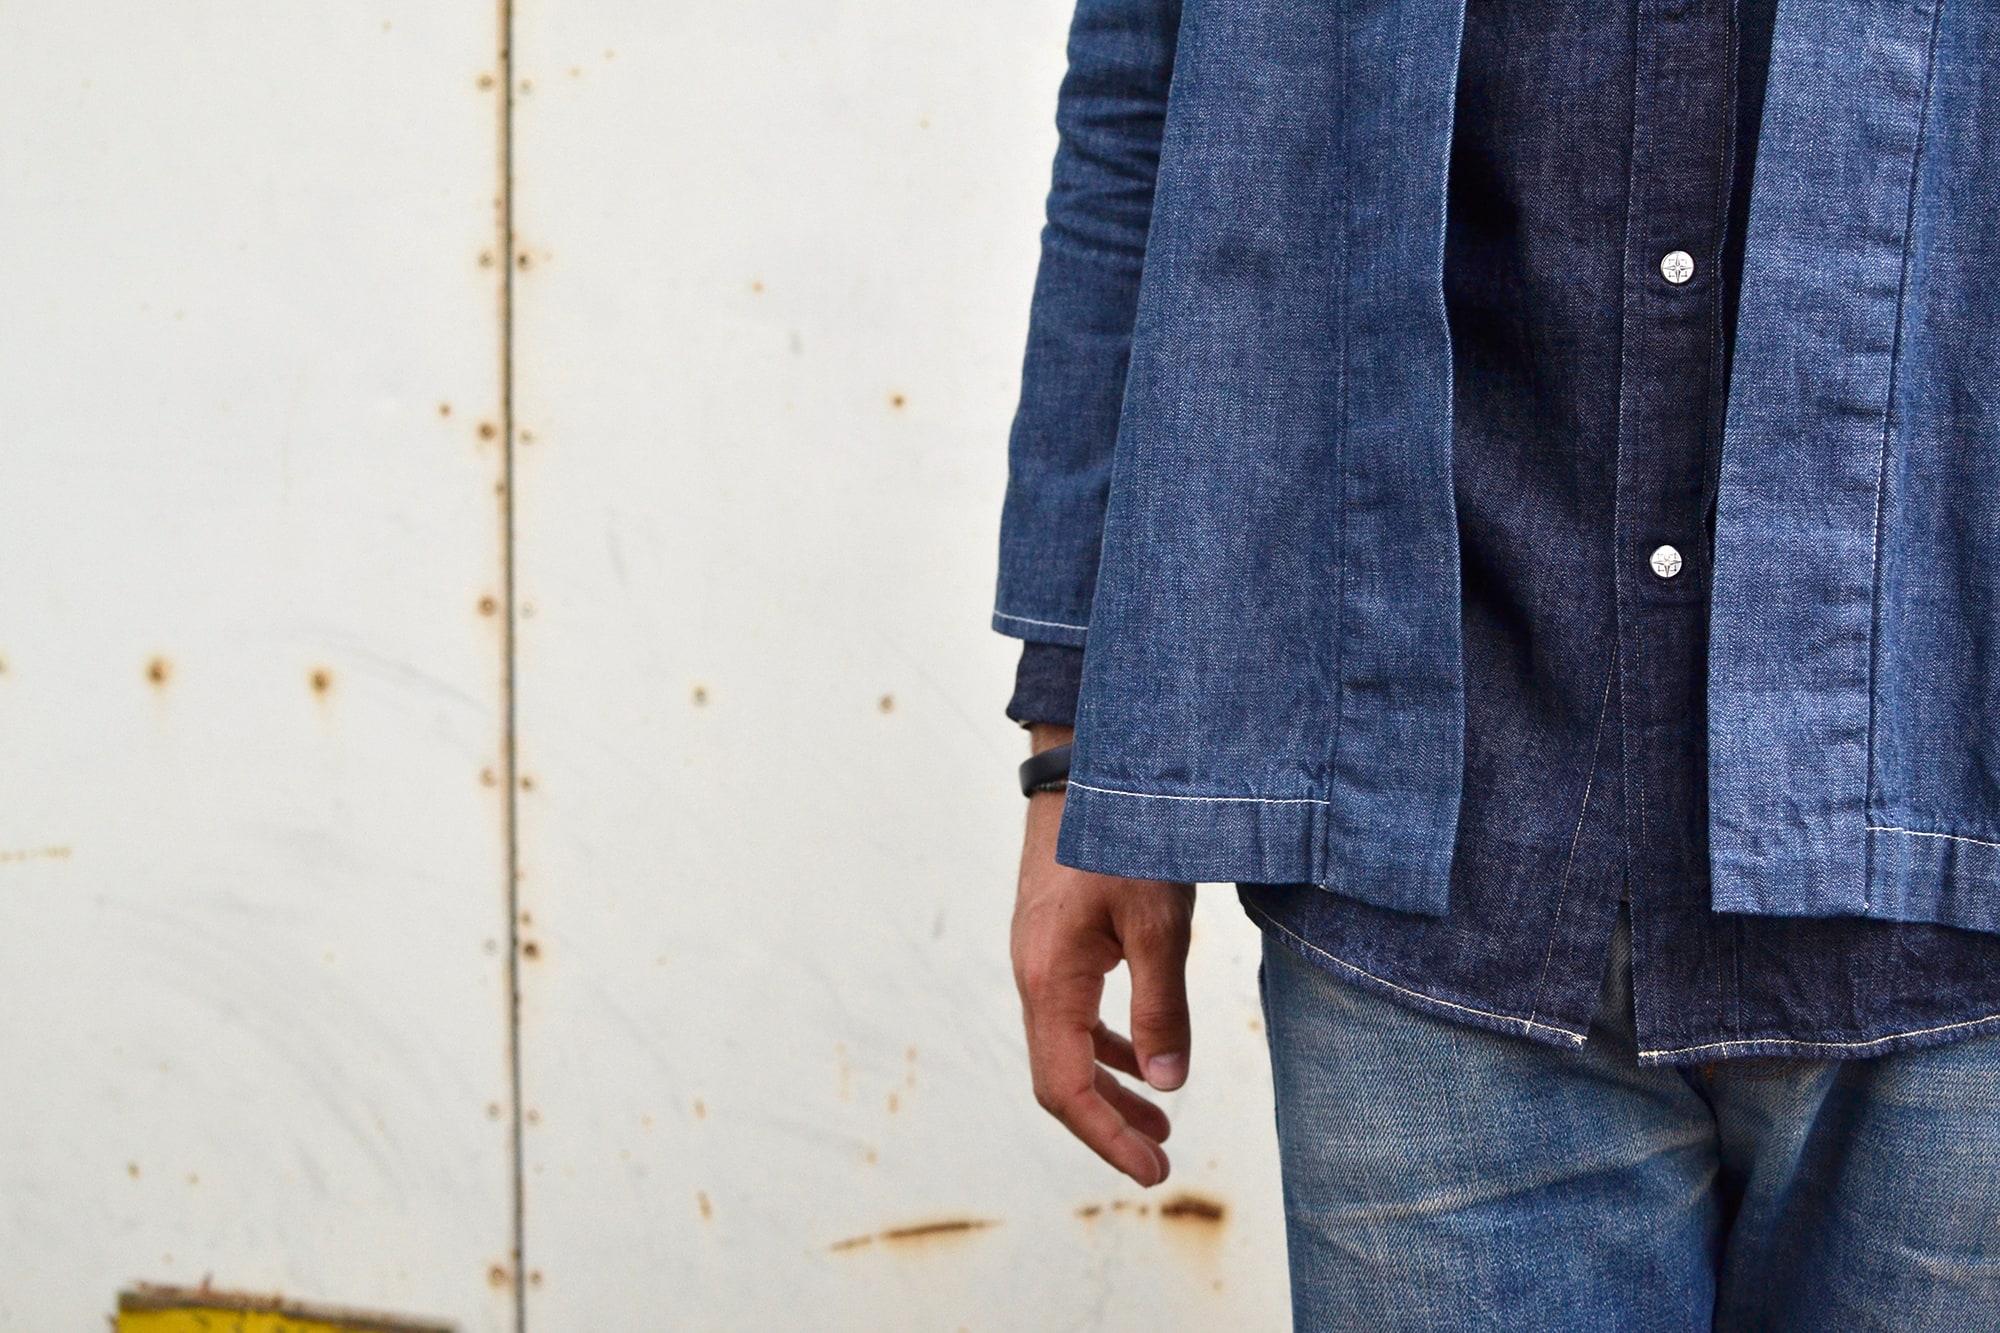 comment porter une noragi Visvim avec un layering de denim et d'indigo et un jeans apc tapered